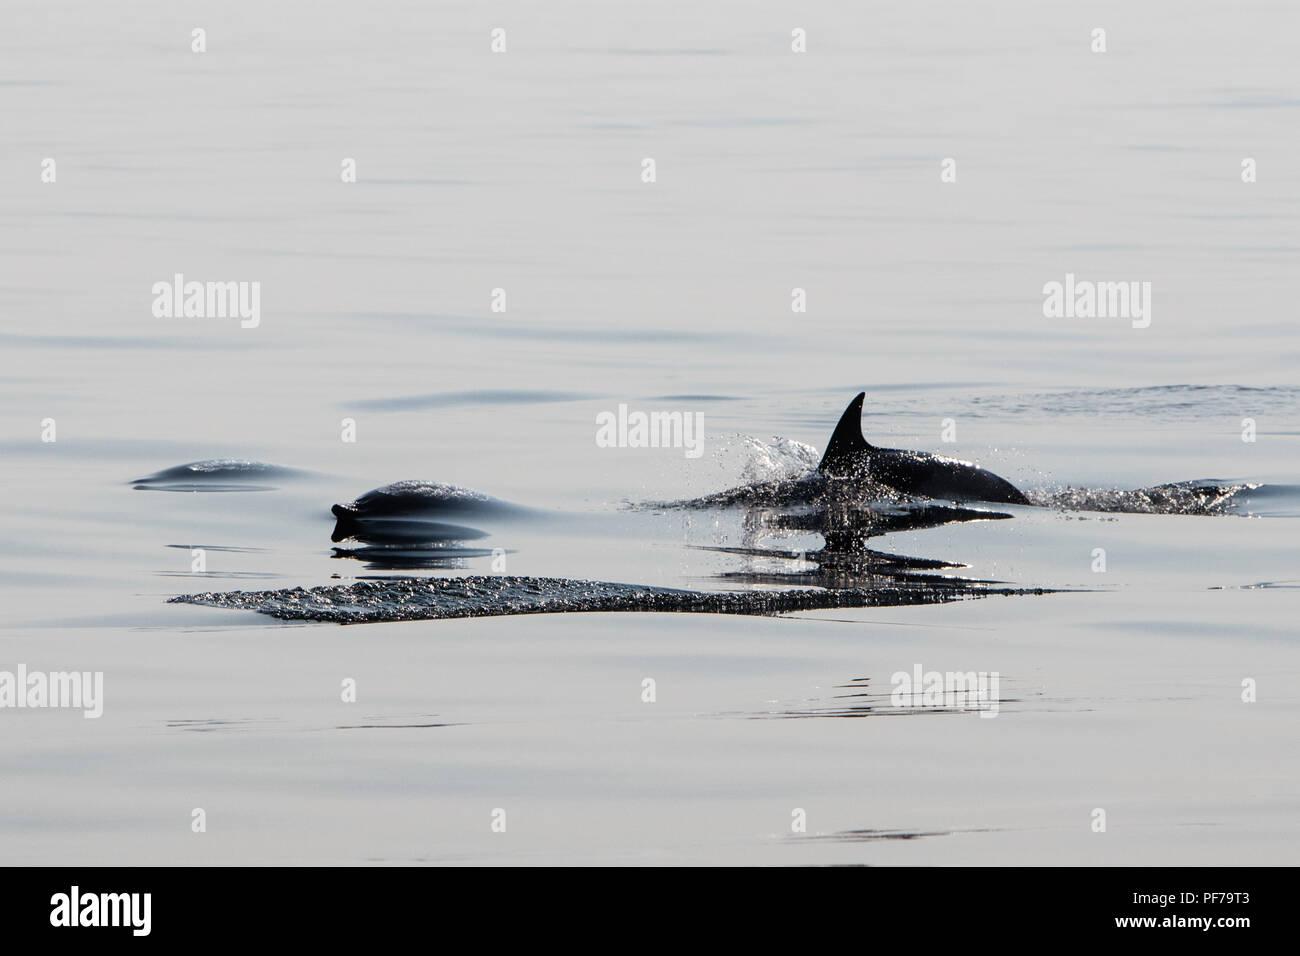 Quick and agile Short-Beaked Common dolphins, Delphinus delphis, swim in the north Atlantic Ocean off Cape Cod, Massachusetts. - Stock Image